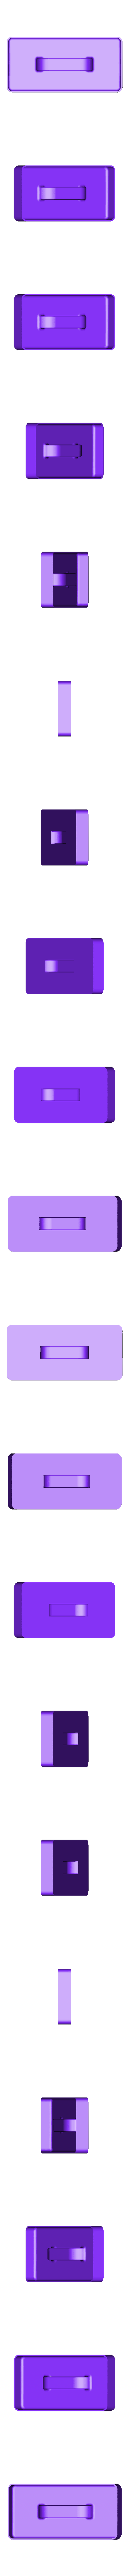 Shelf.stl Download STL file ToolBox • 3D printer template, EliGreen